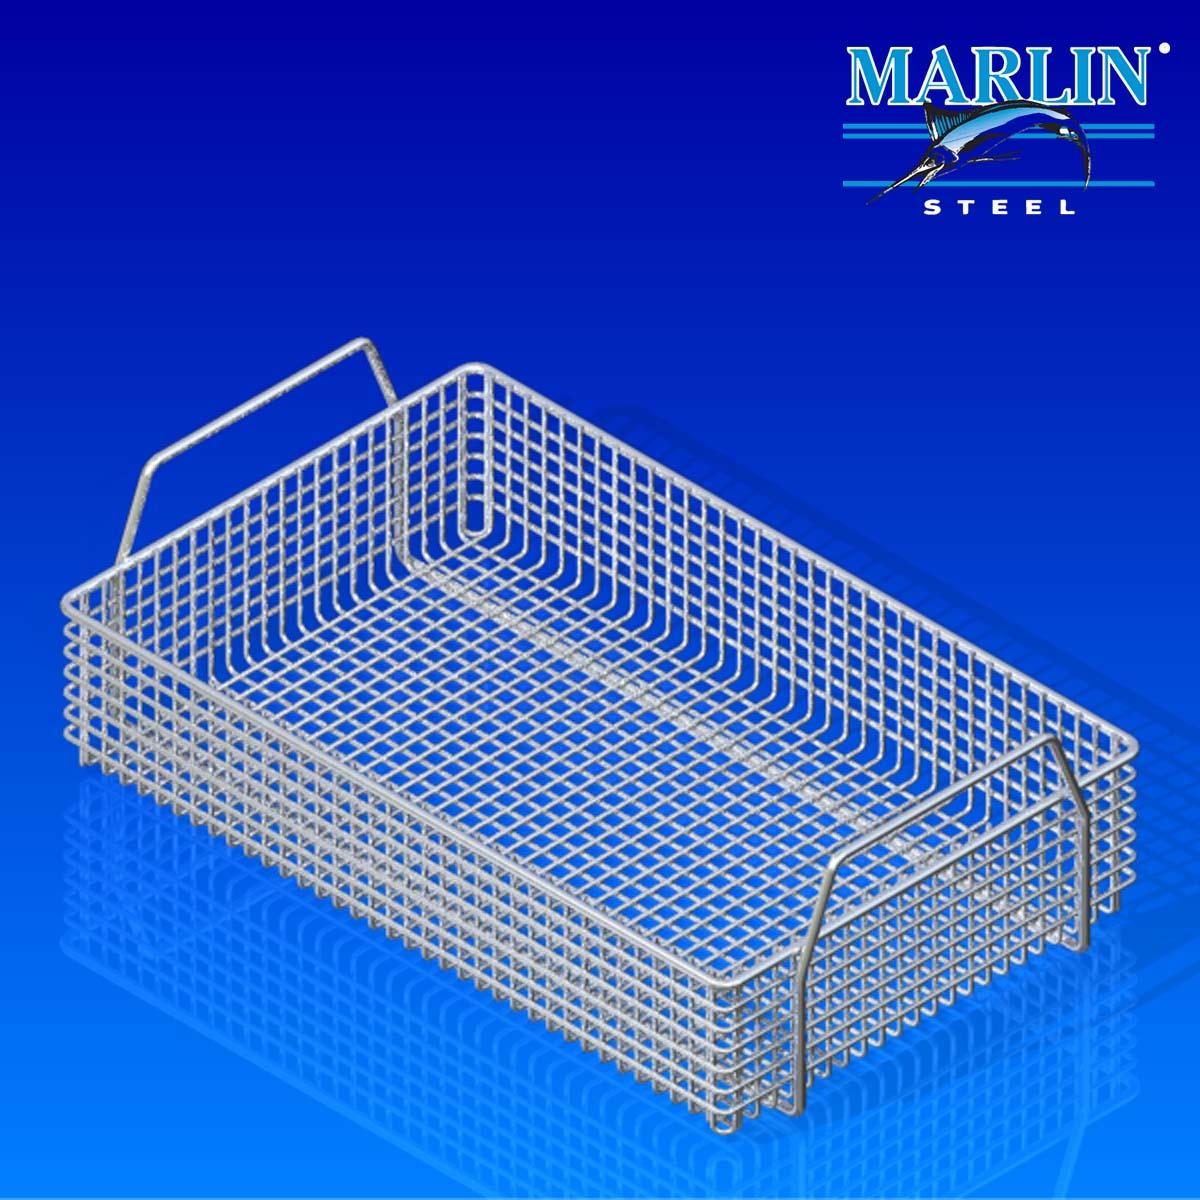 Marlin Steel Basket with Handles 823001